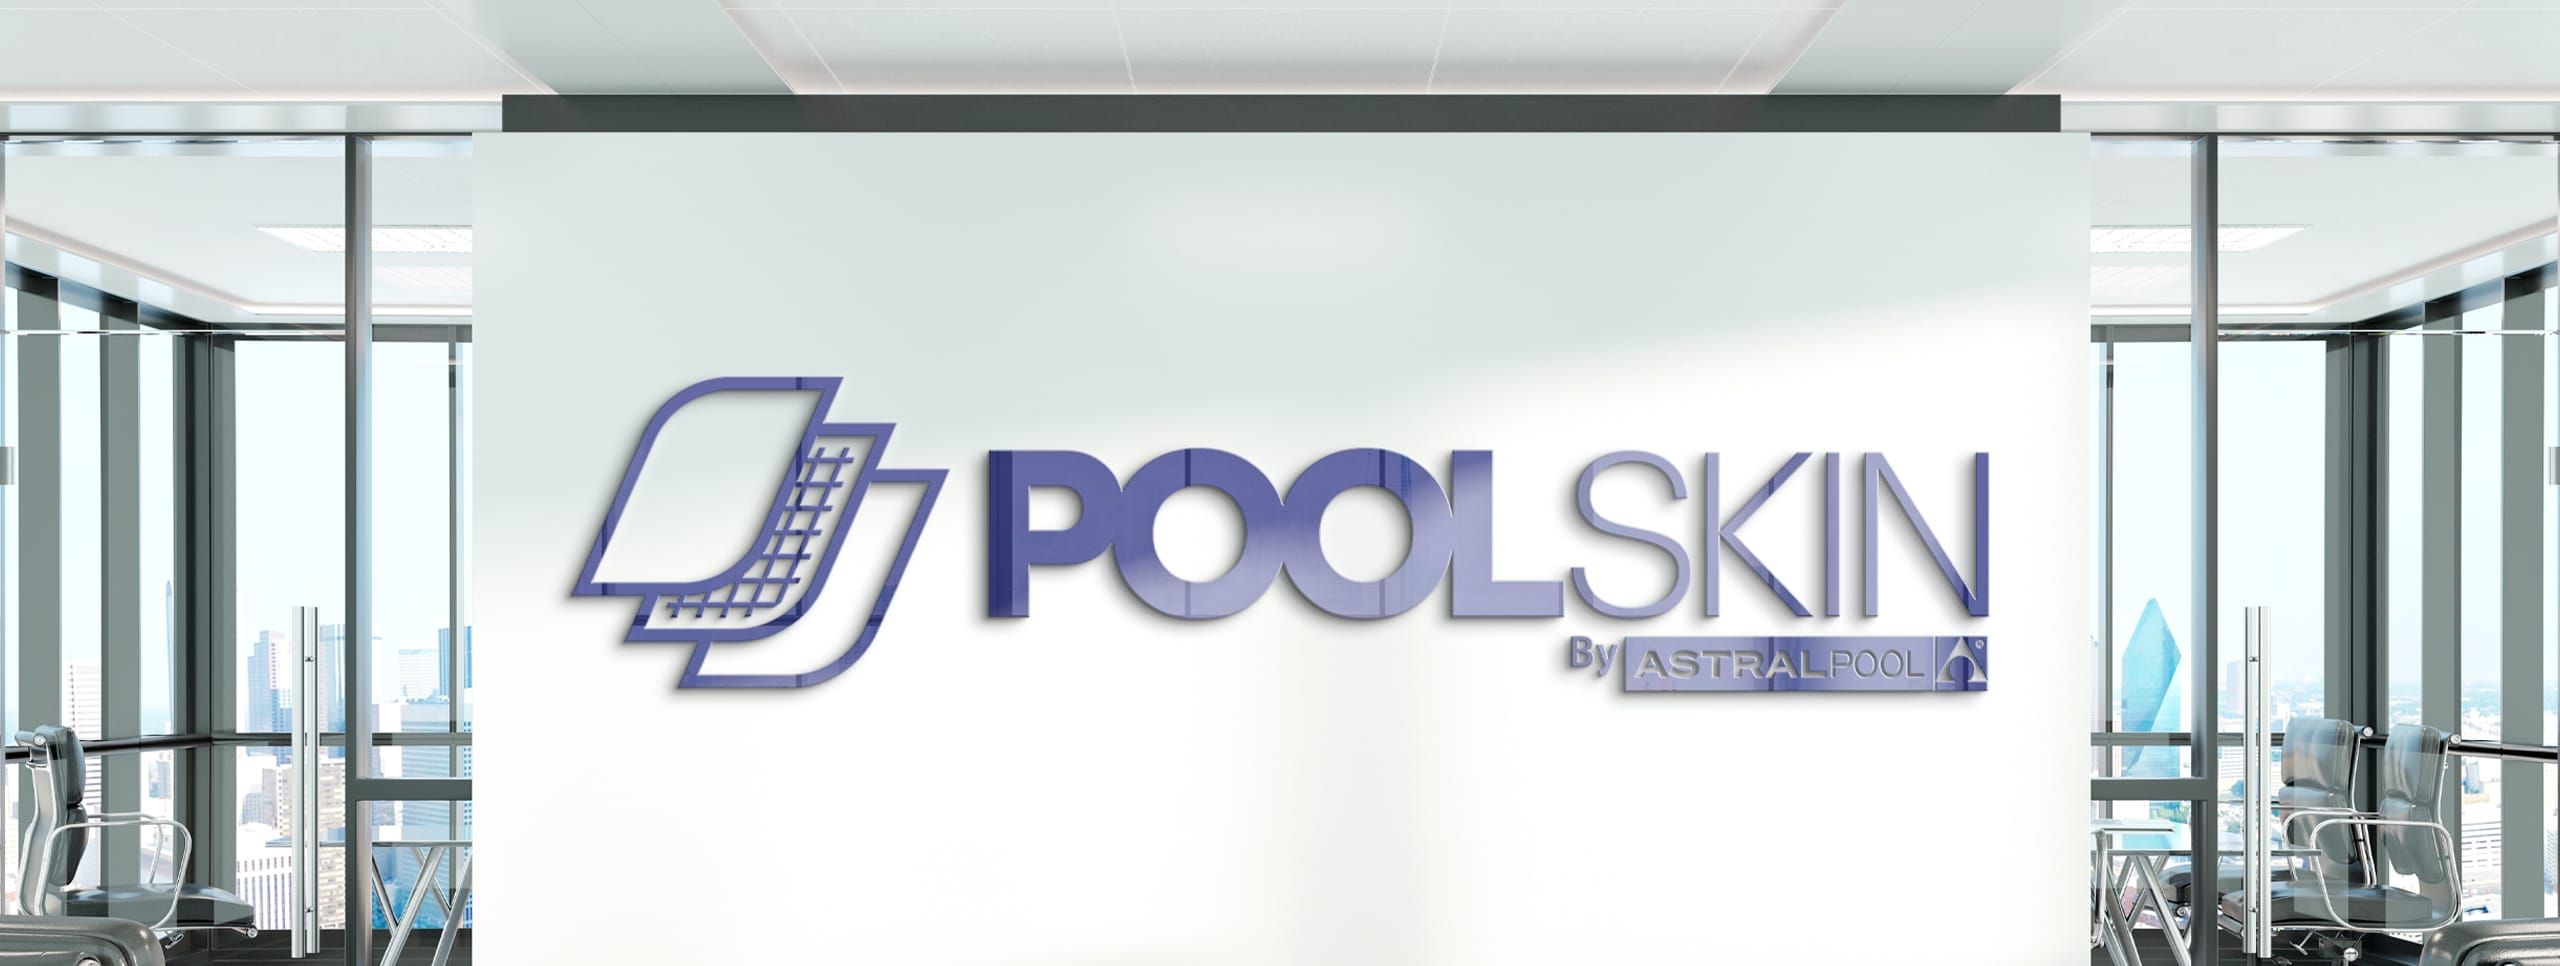 poolskin-copie